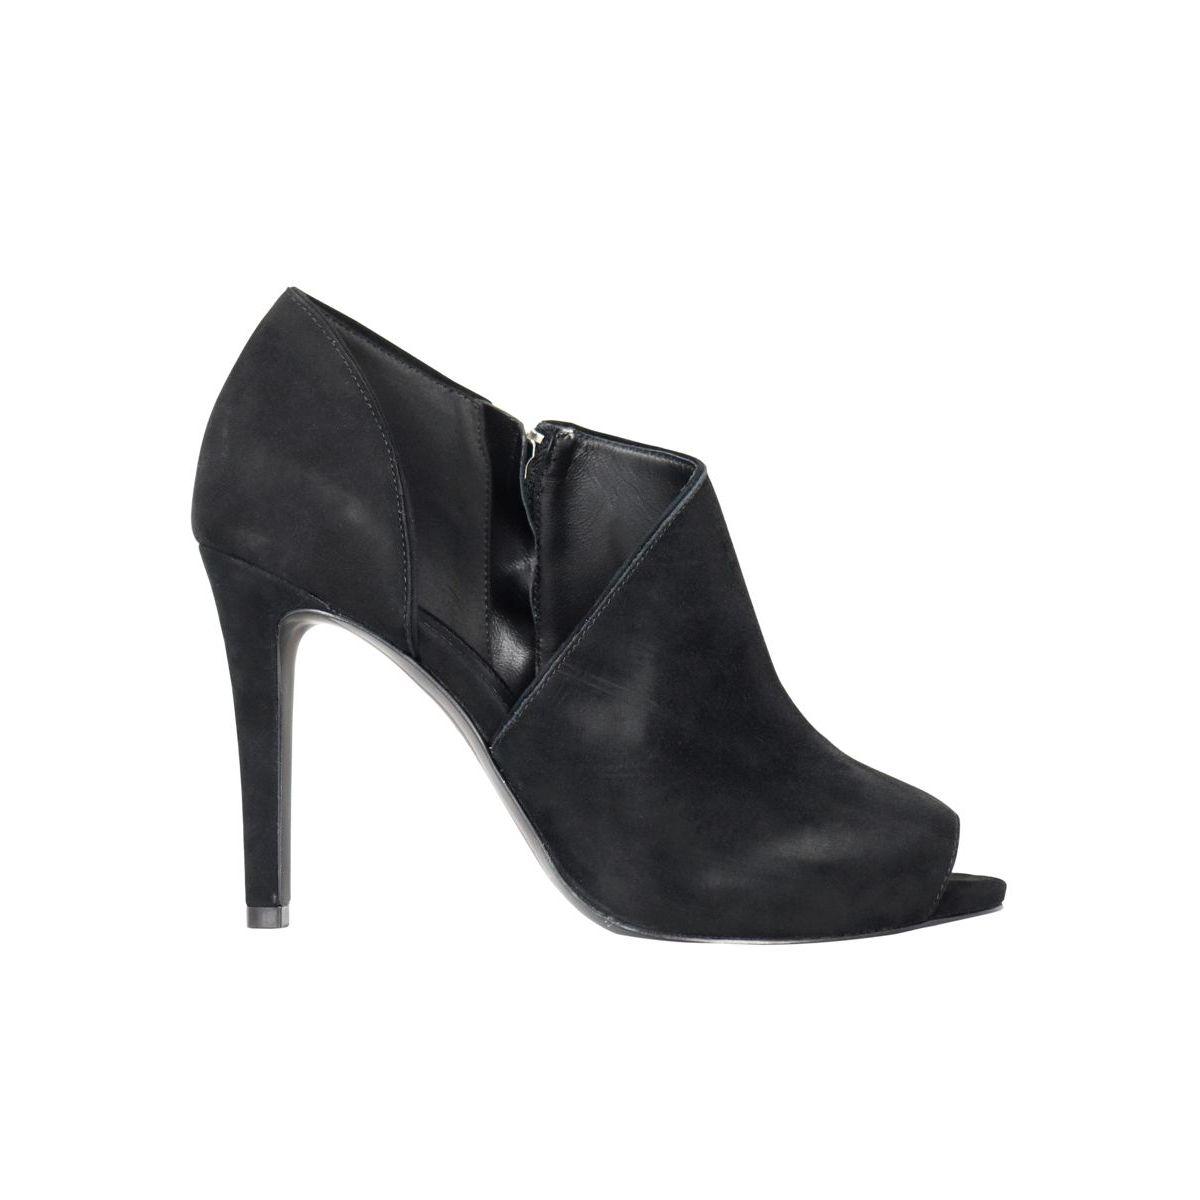 Elodie Bottie boots Black Michael Kors